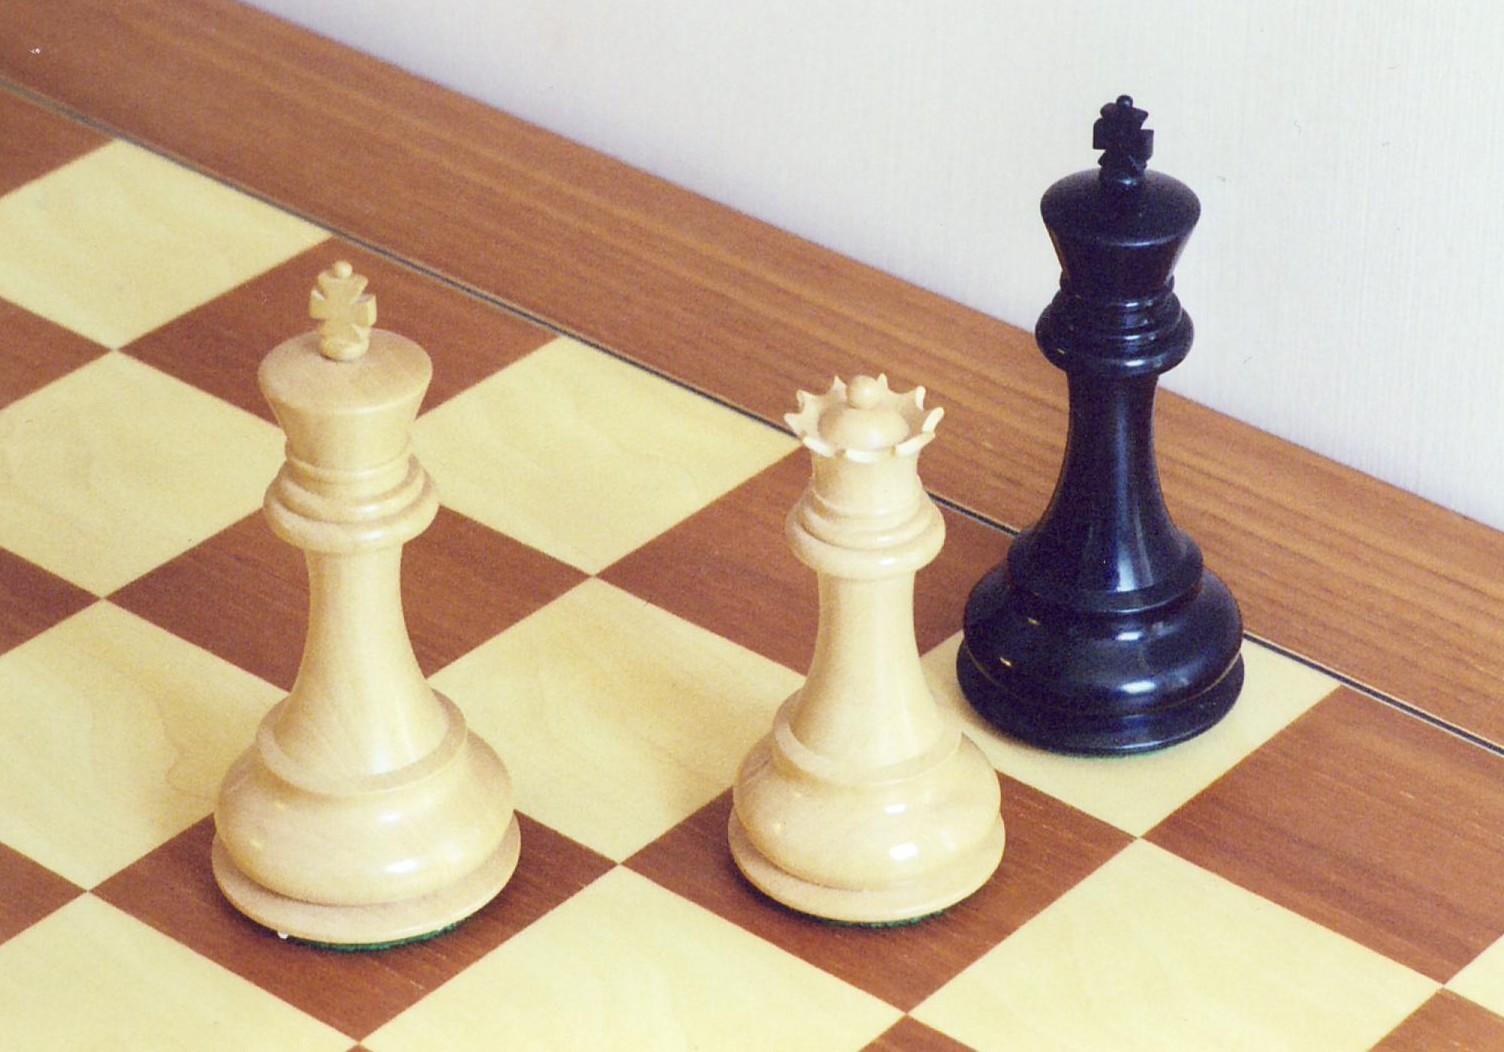 https://i1.wp.com/upload.wikimedia.org/wikipedia/commons/c/c4/CheckmateProper.jpg